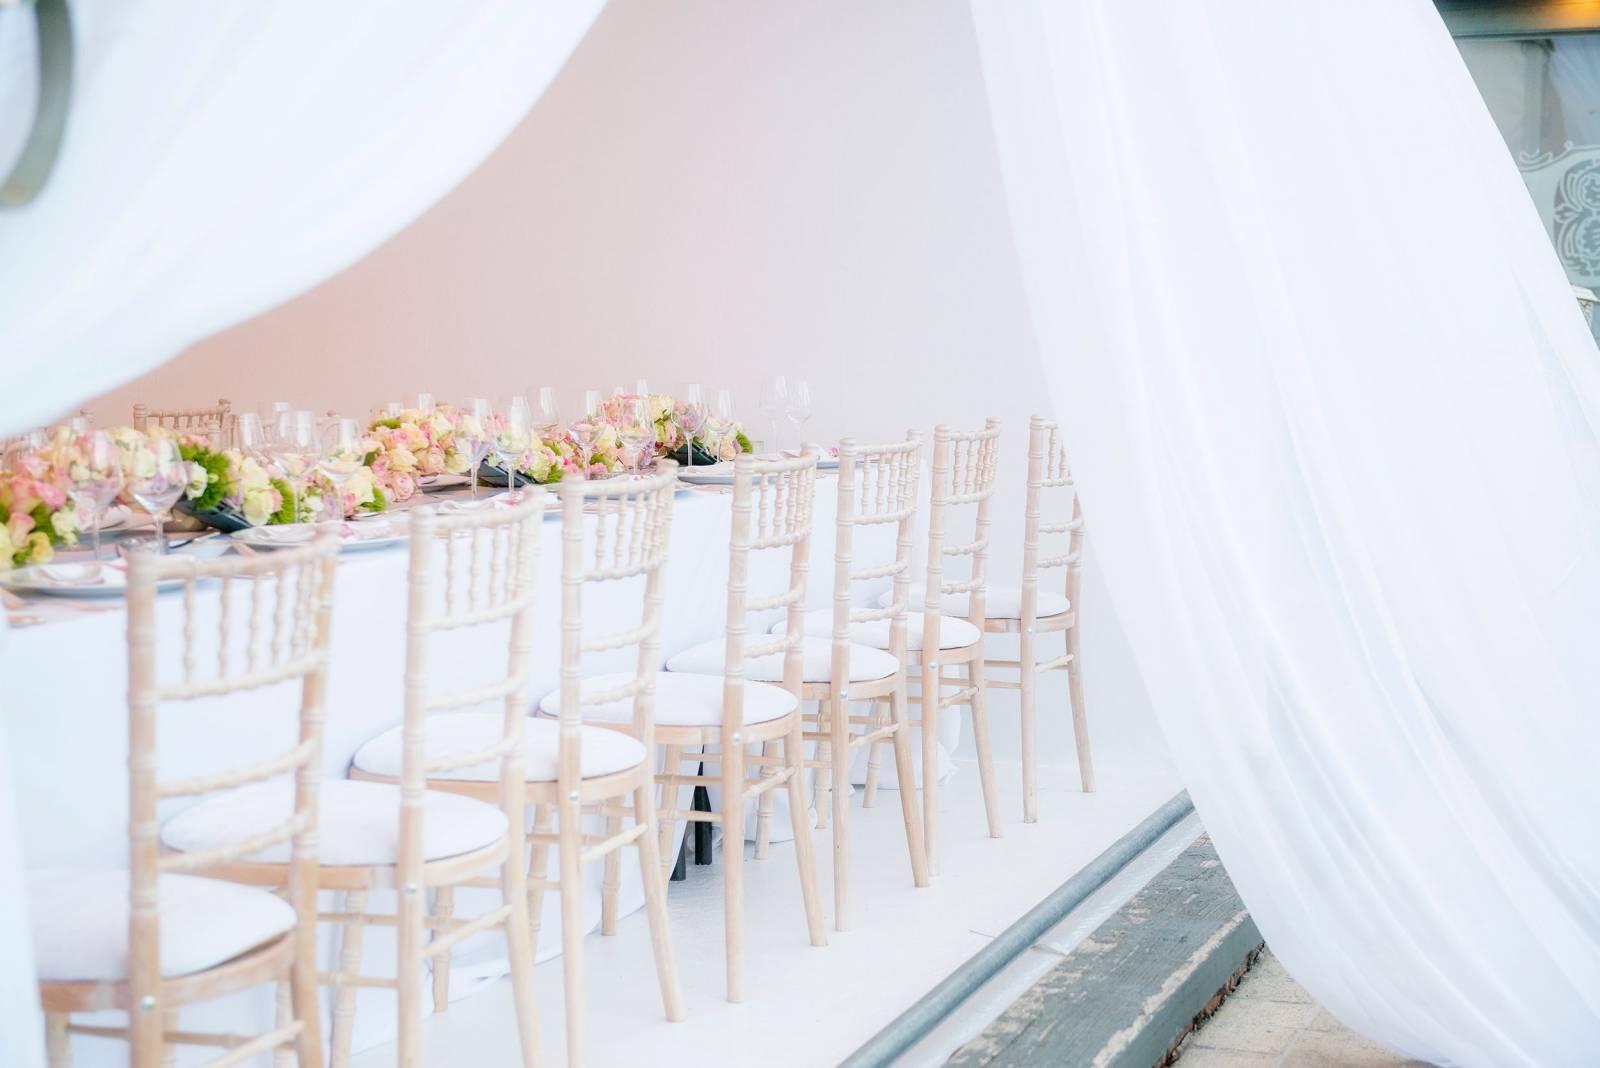 Feriatus - Wedding Planner - Event Planner - House of Weddings - 20